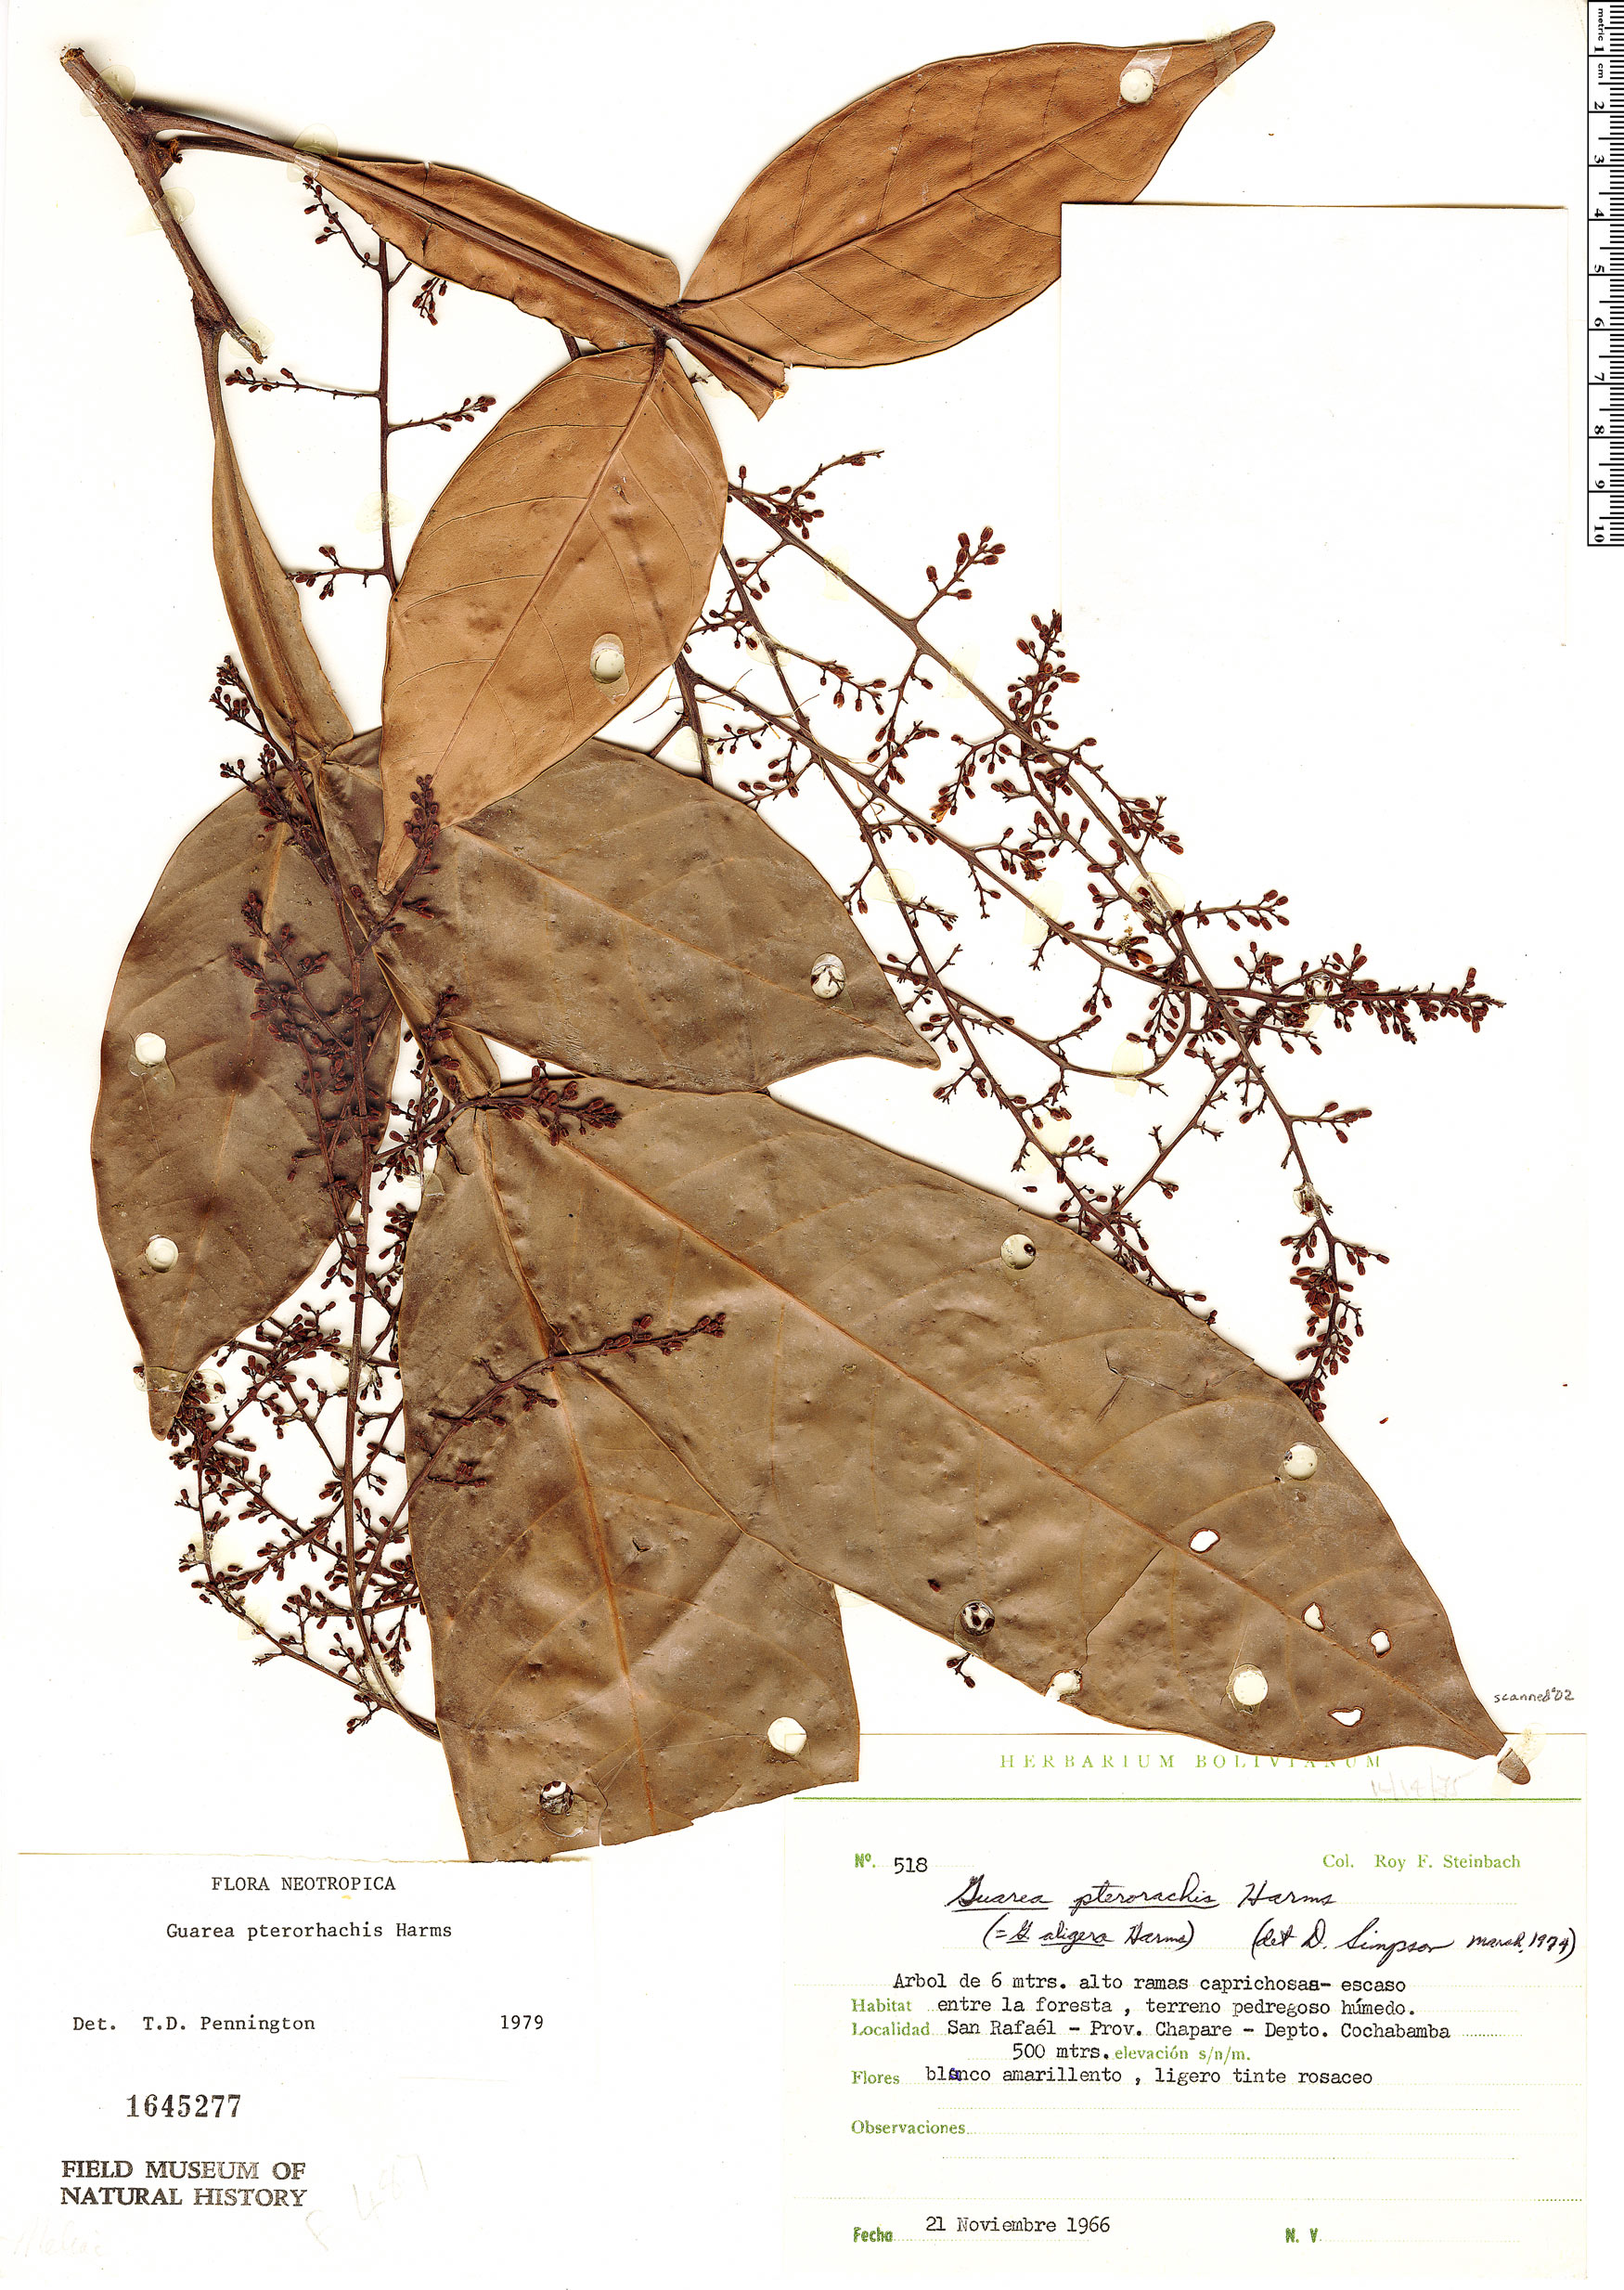 Specimen: Guarea pterorhachis